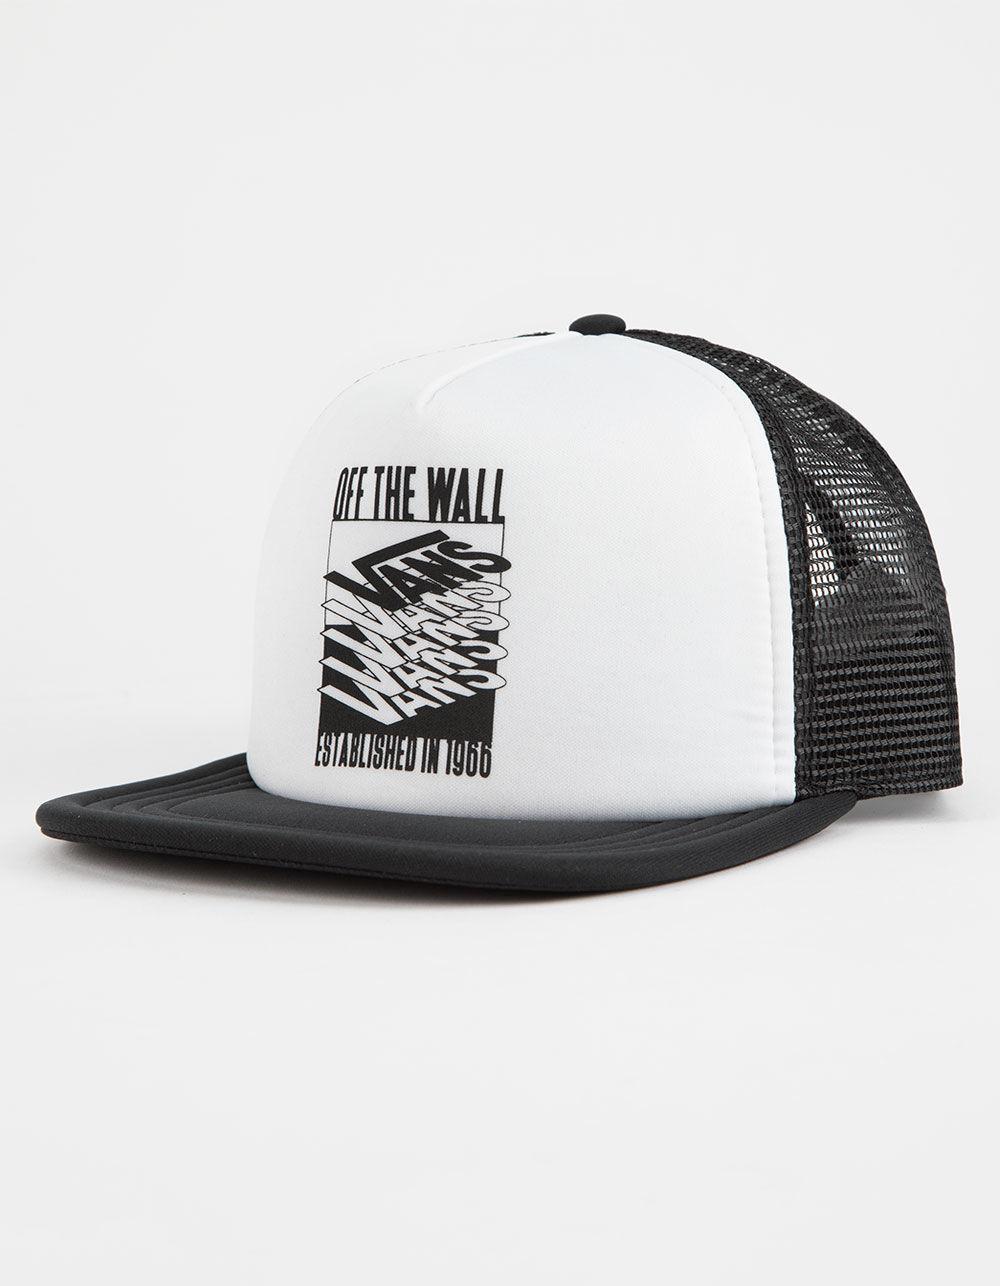 Lyst - Vans Renwick Mens Trucker Hat in White for Men b5270075d